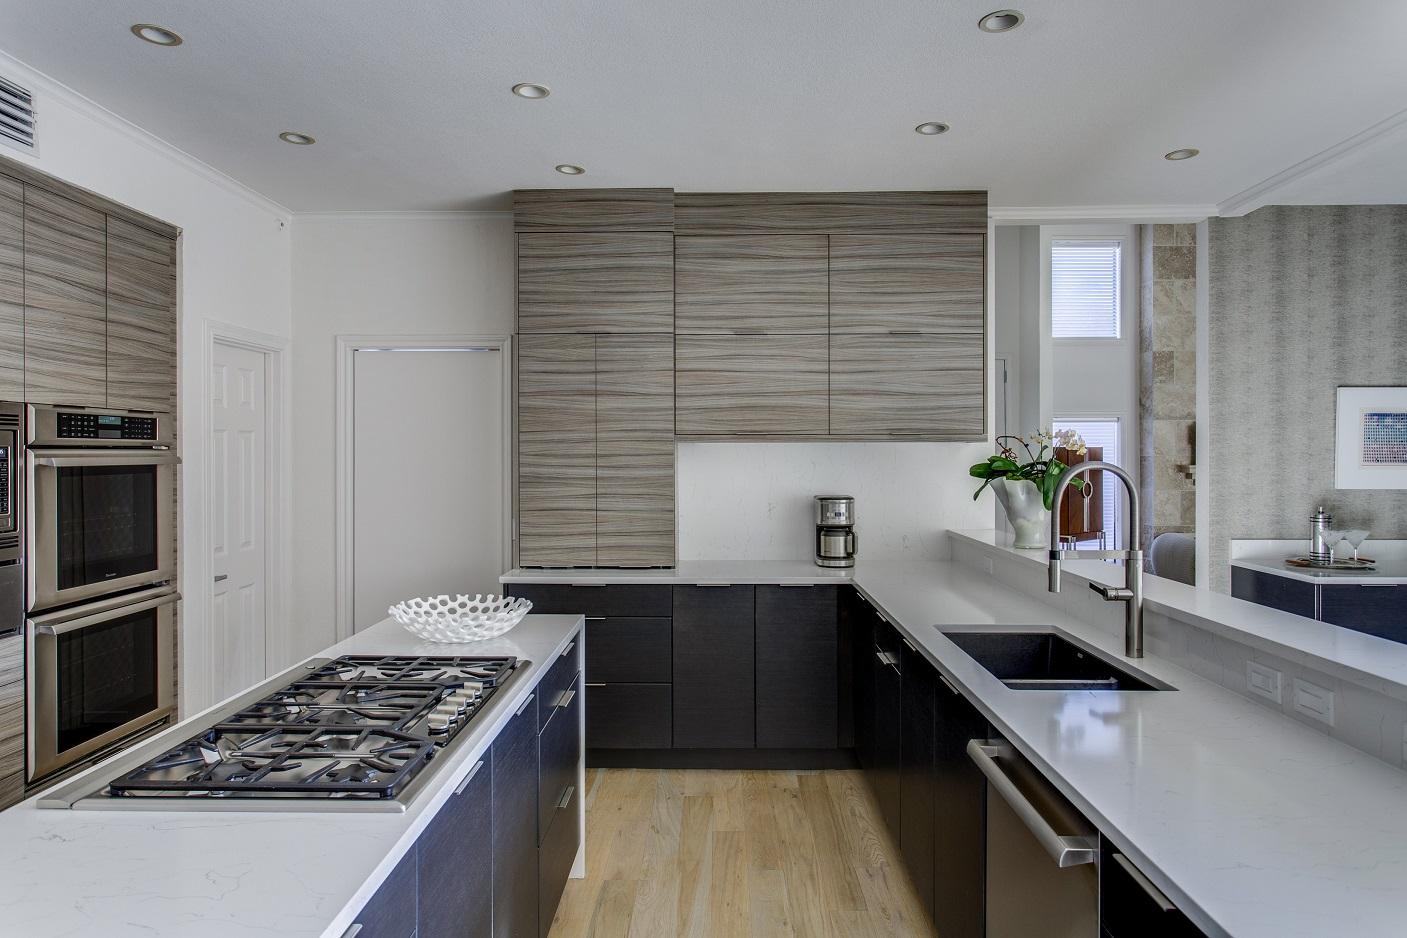 A Focus on Quartz Countertops: Caesarstone style | Kitchen Design ...